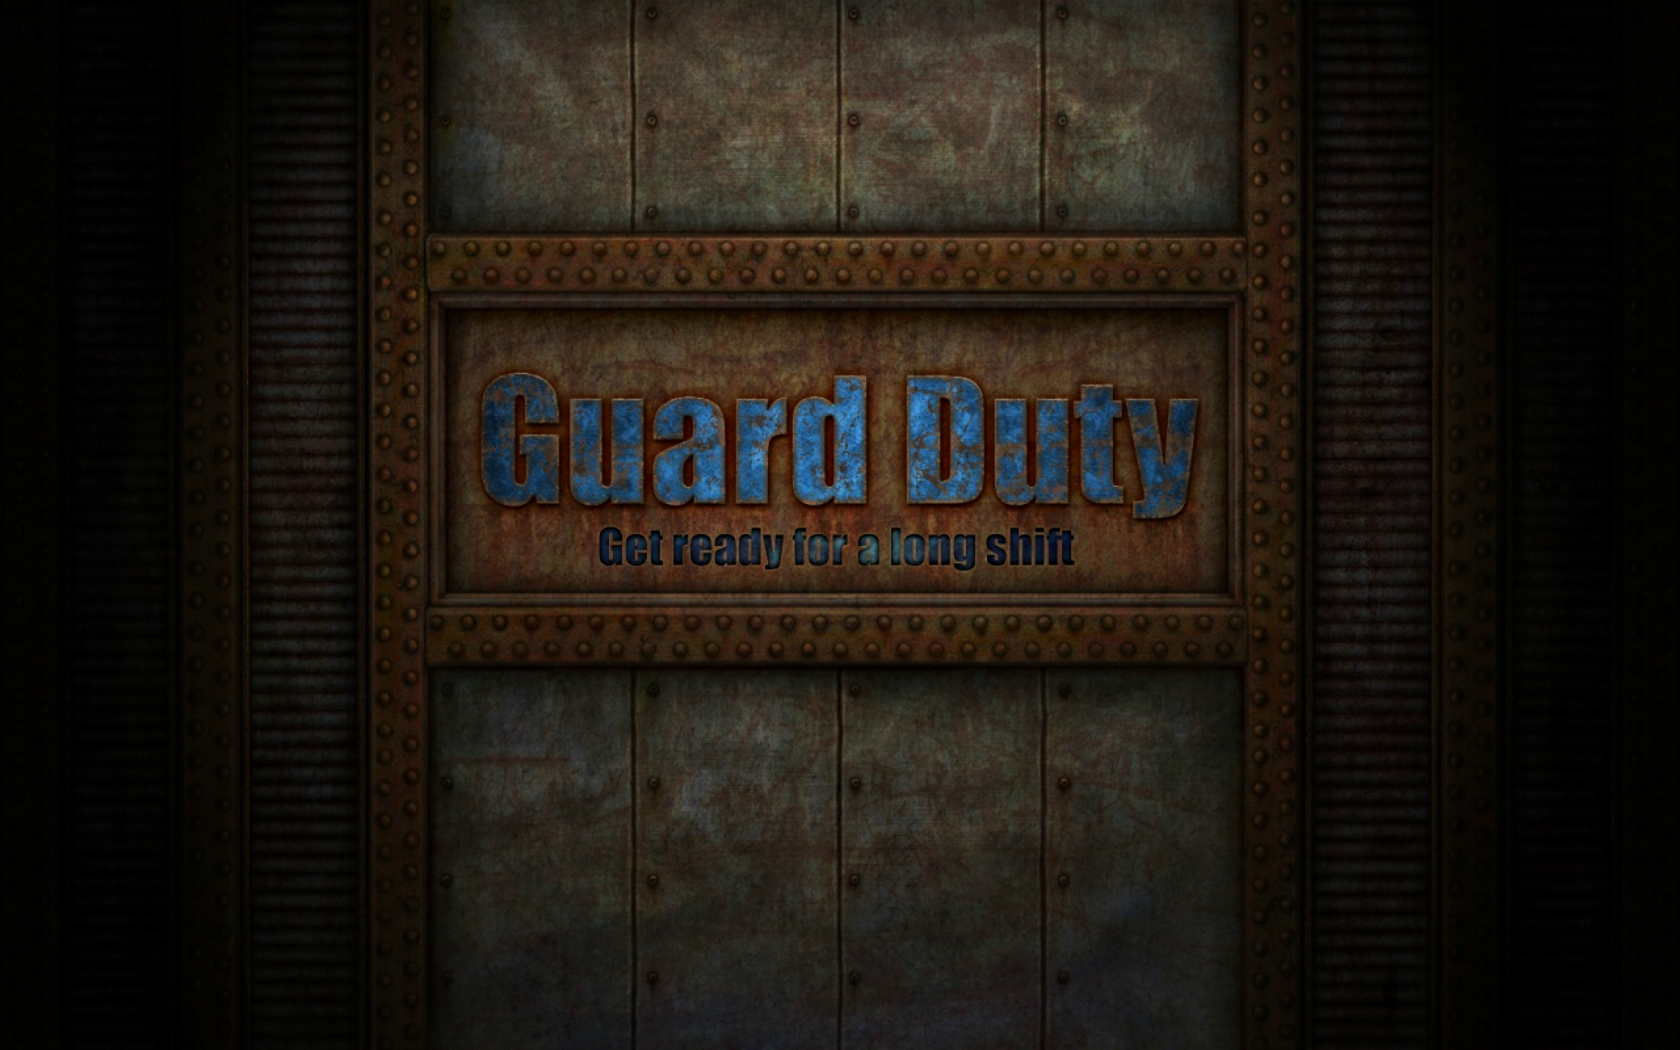 Guard duty wallpaper image mod db - Security guard hd images ...